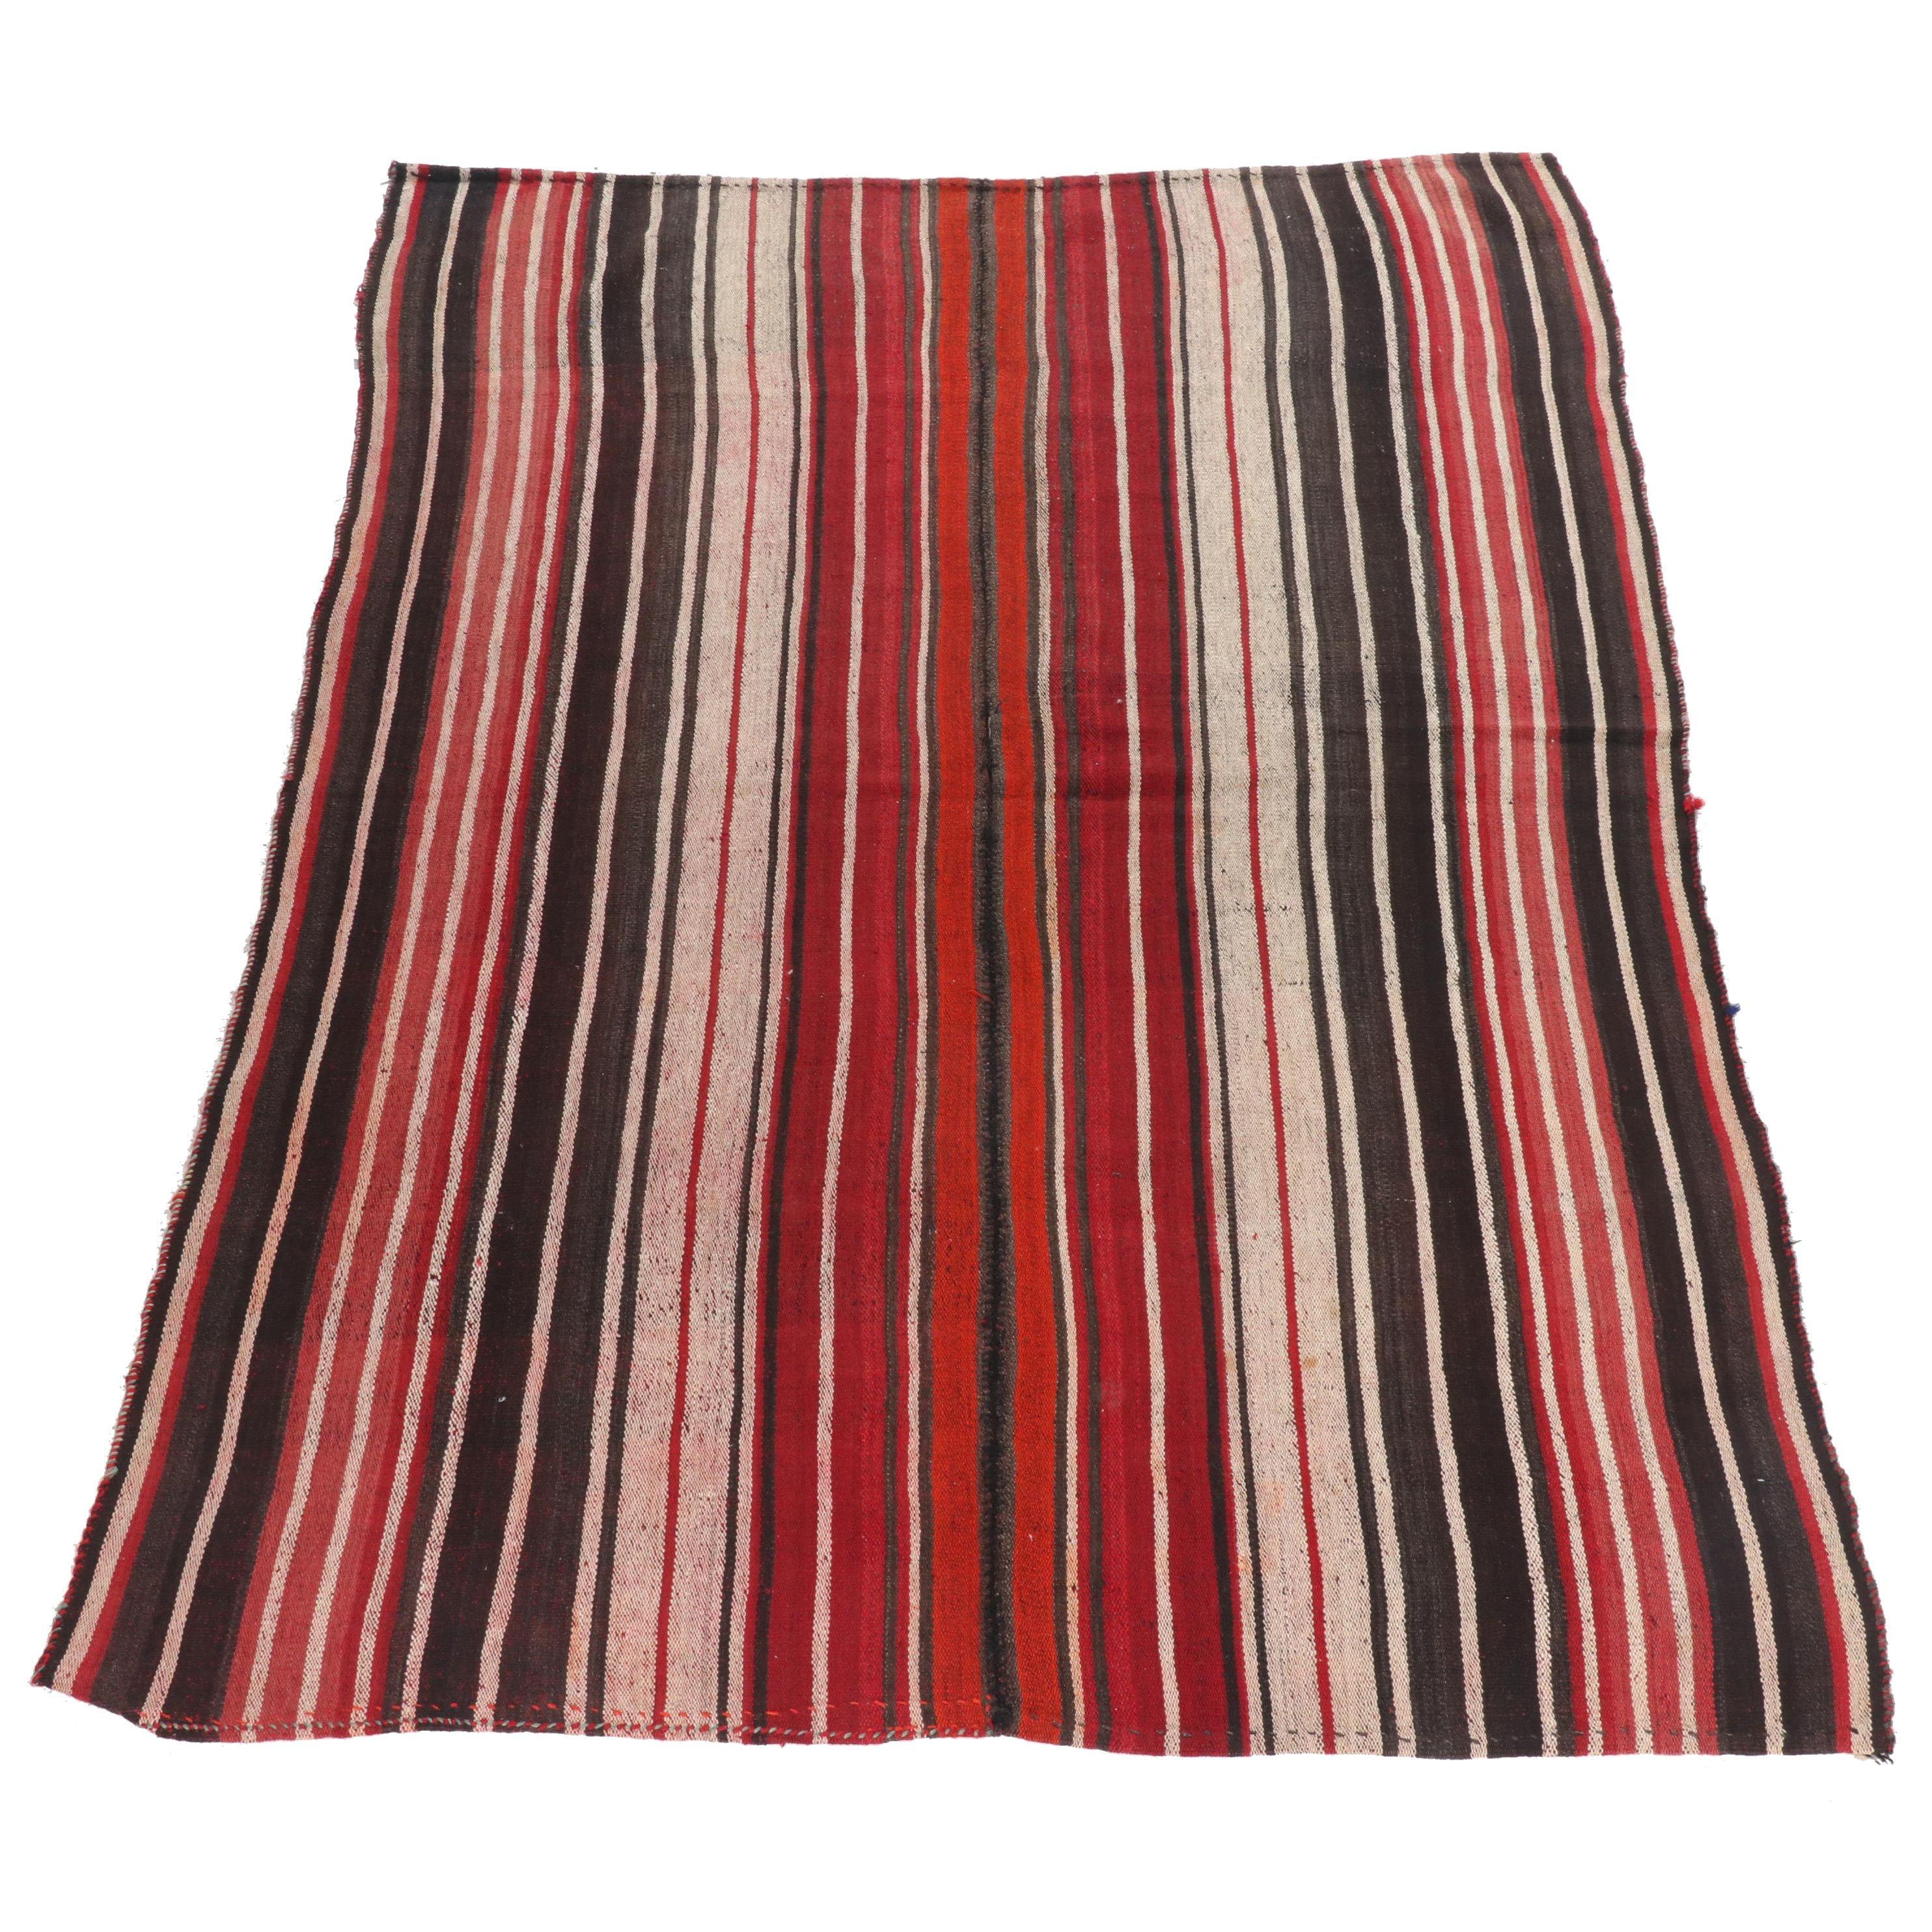 Handwoven Persian Kilim Wool Area Rug